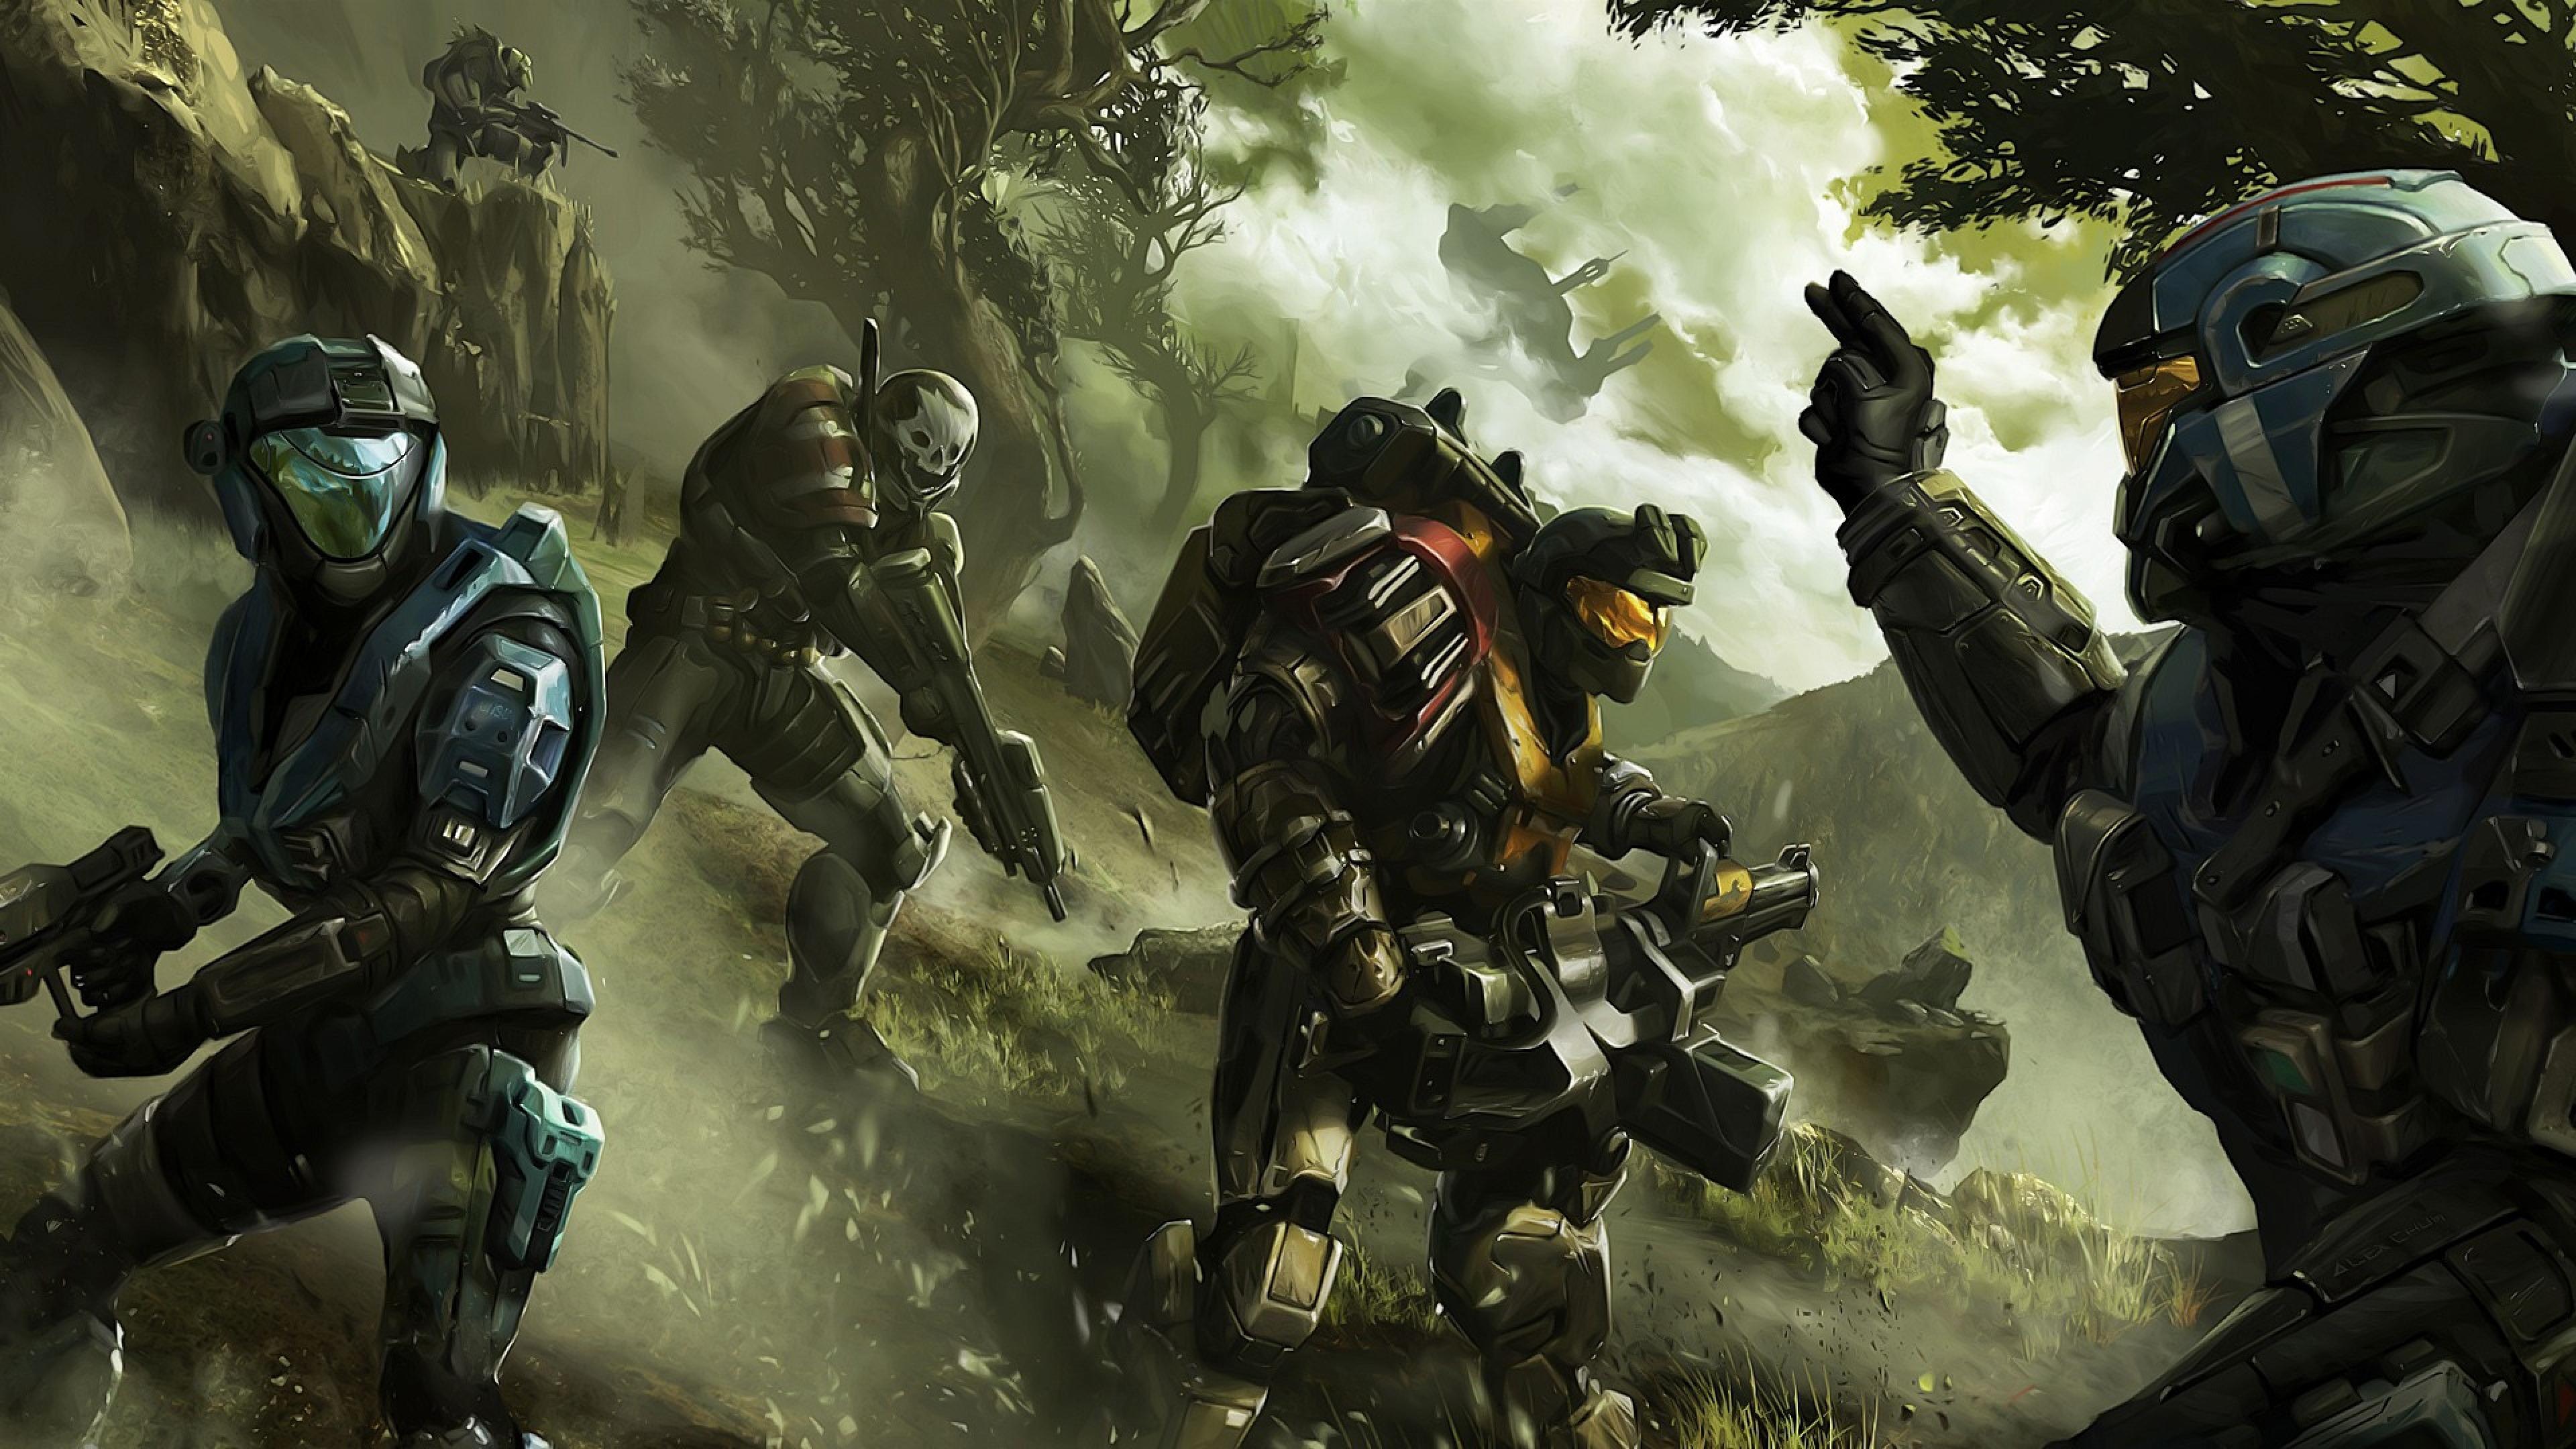 Download Wallpaper 3840x2160 Halo Soldier Commander Trees 4K Ultra 3840x2160